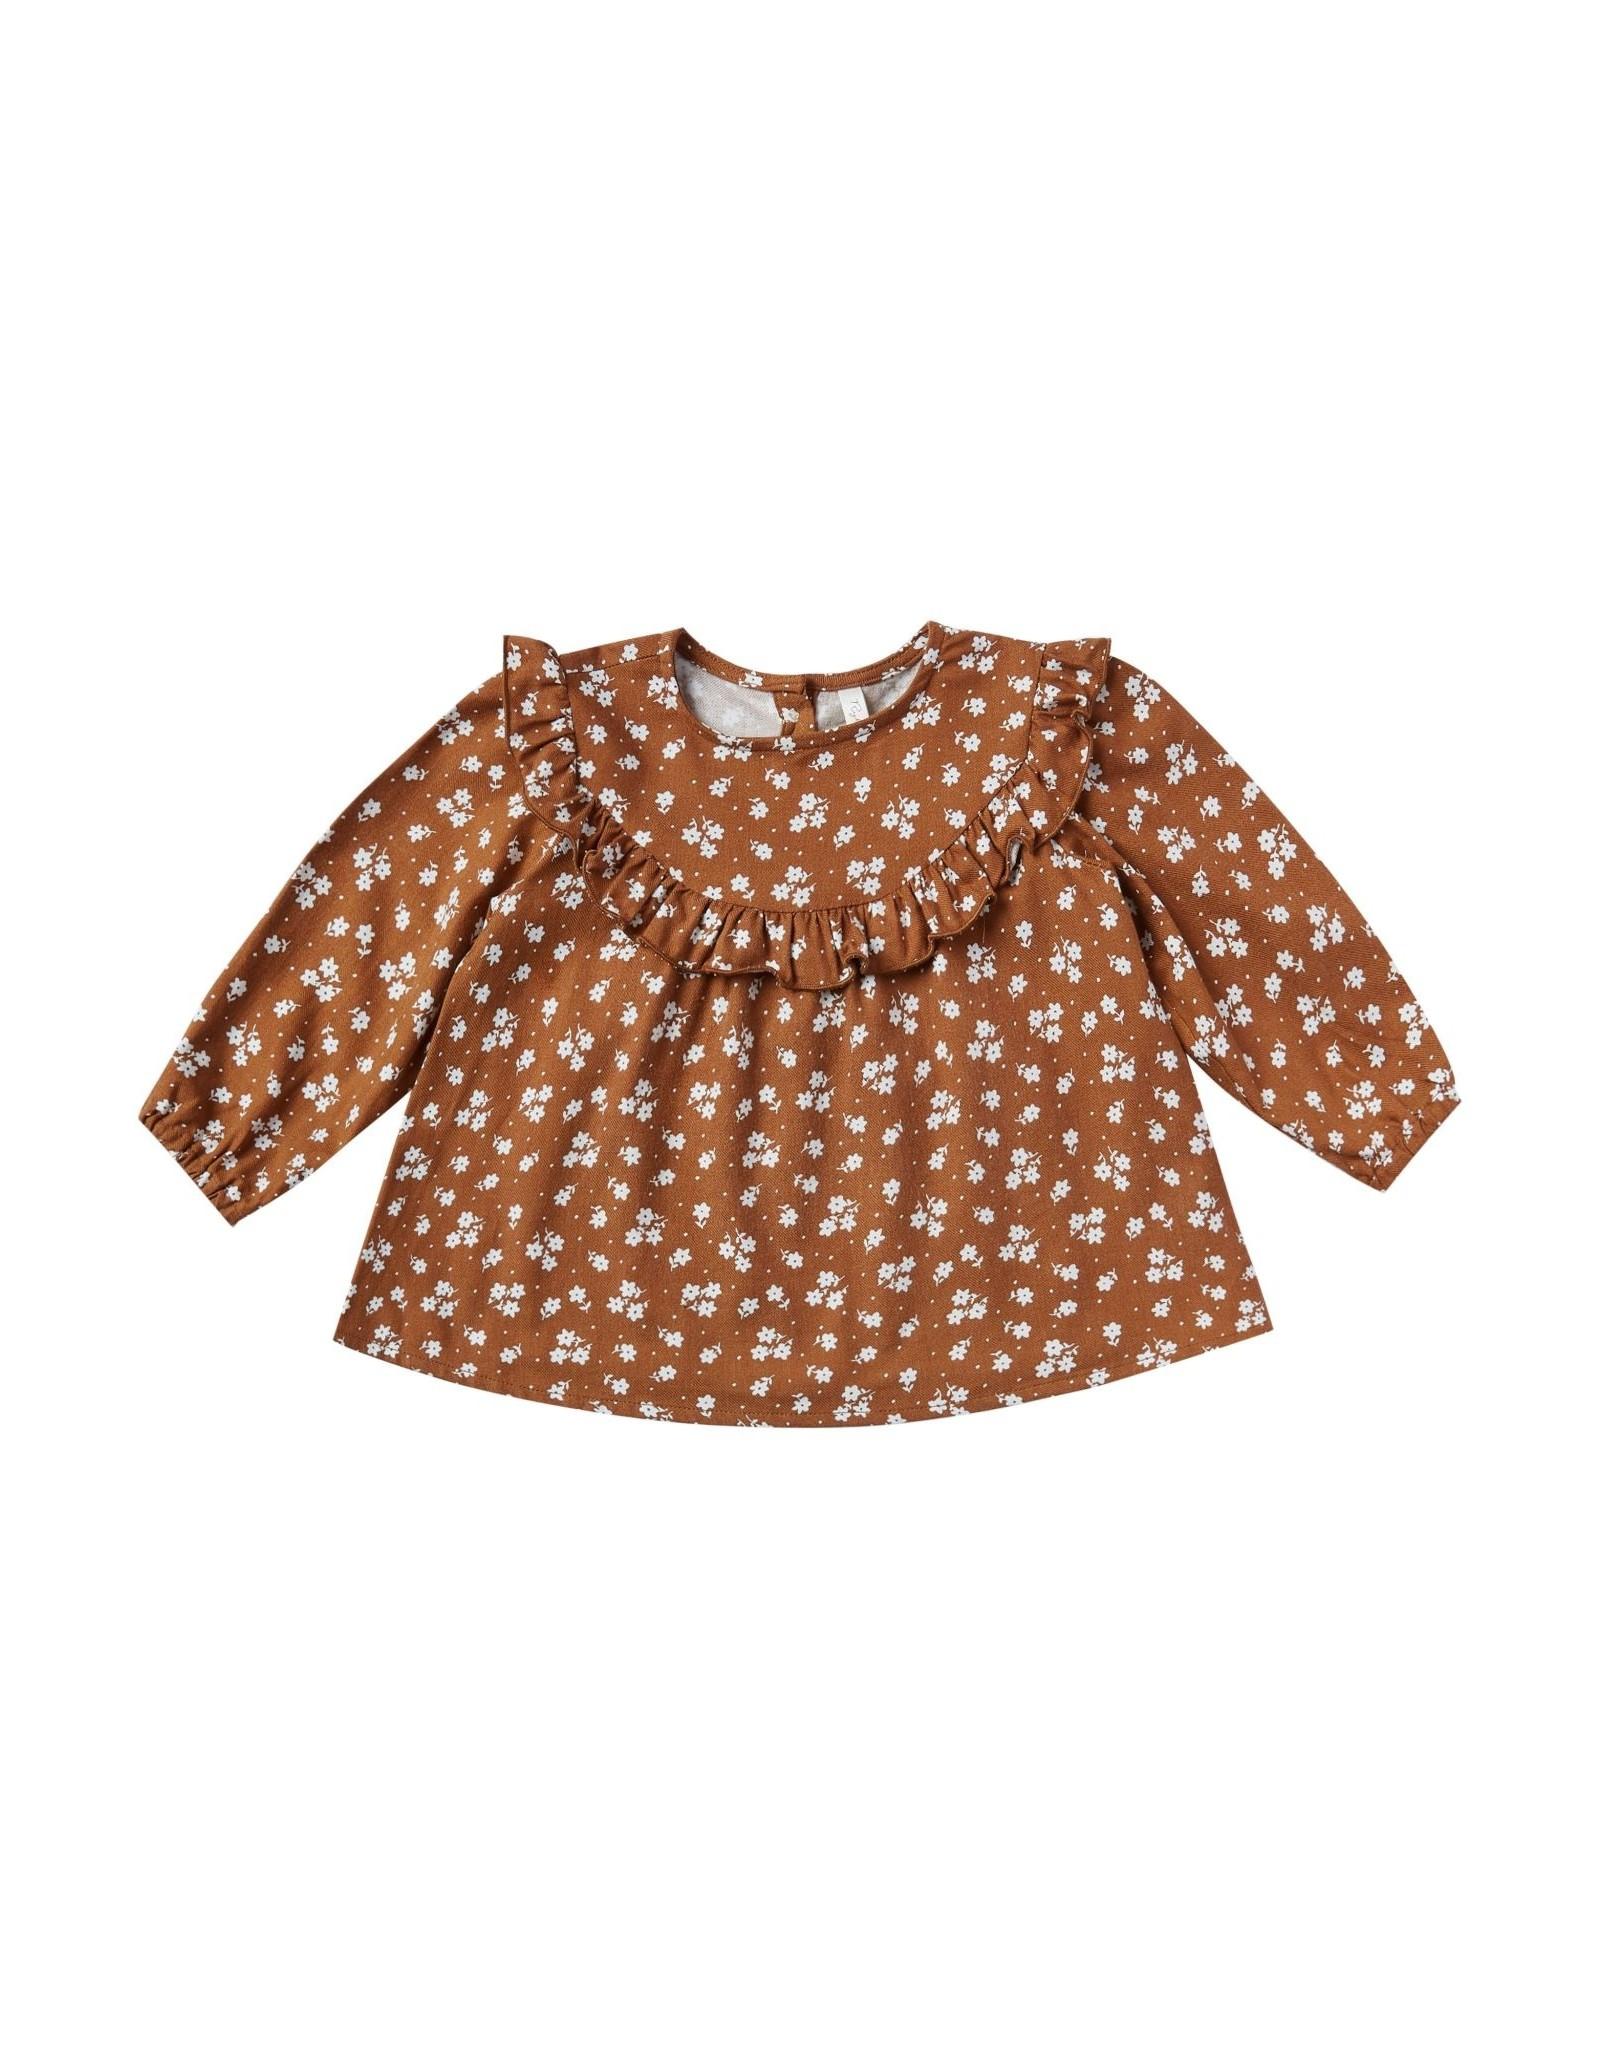 Rylee and Cru ditsy victoria blouse- cinnamon